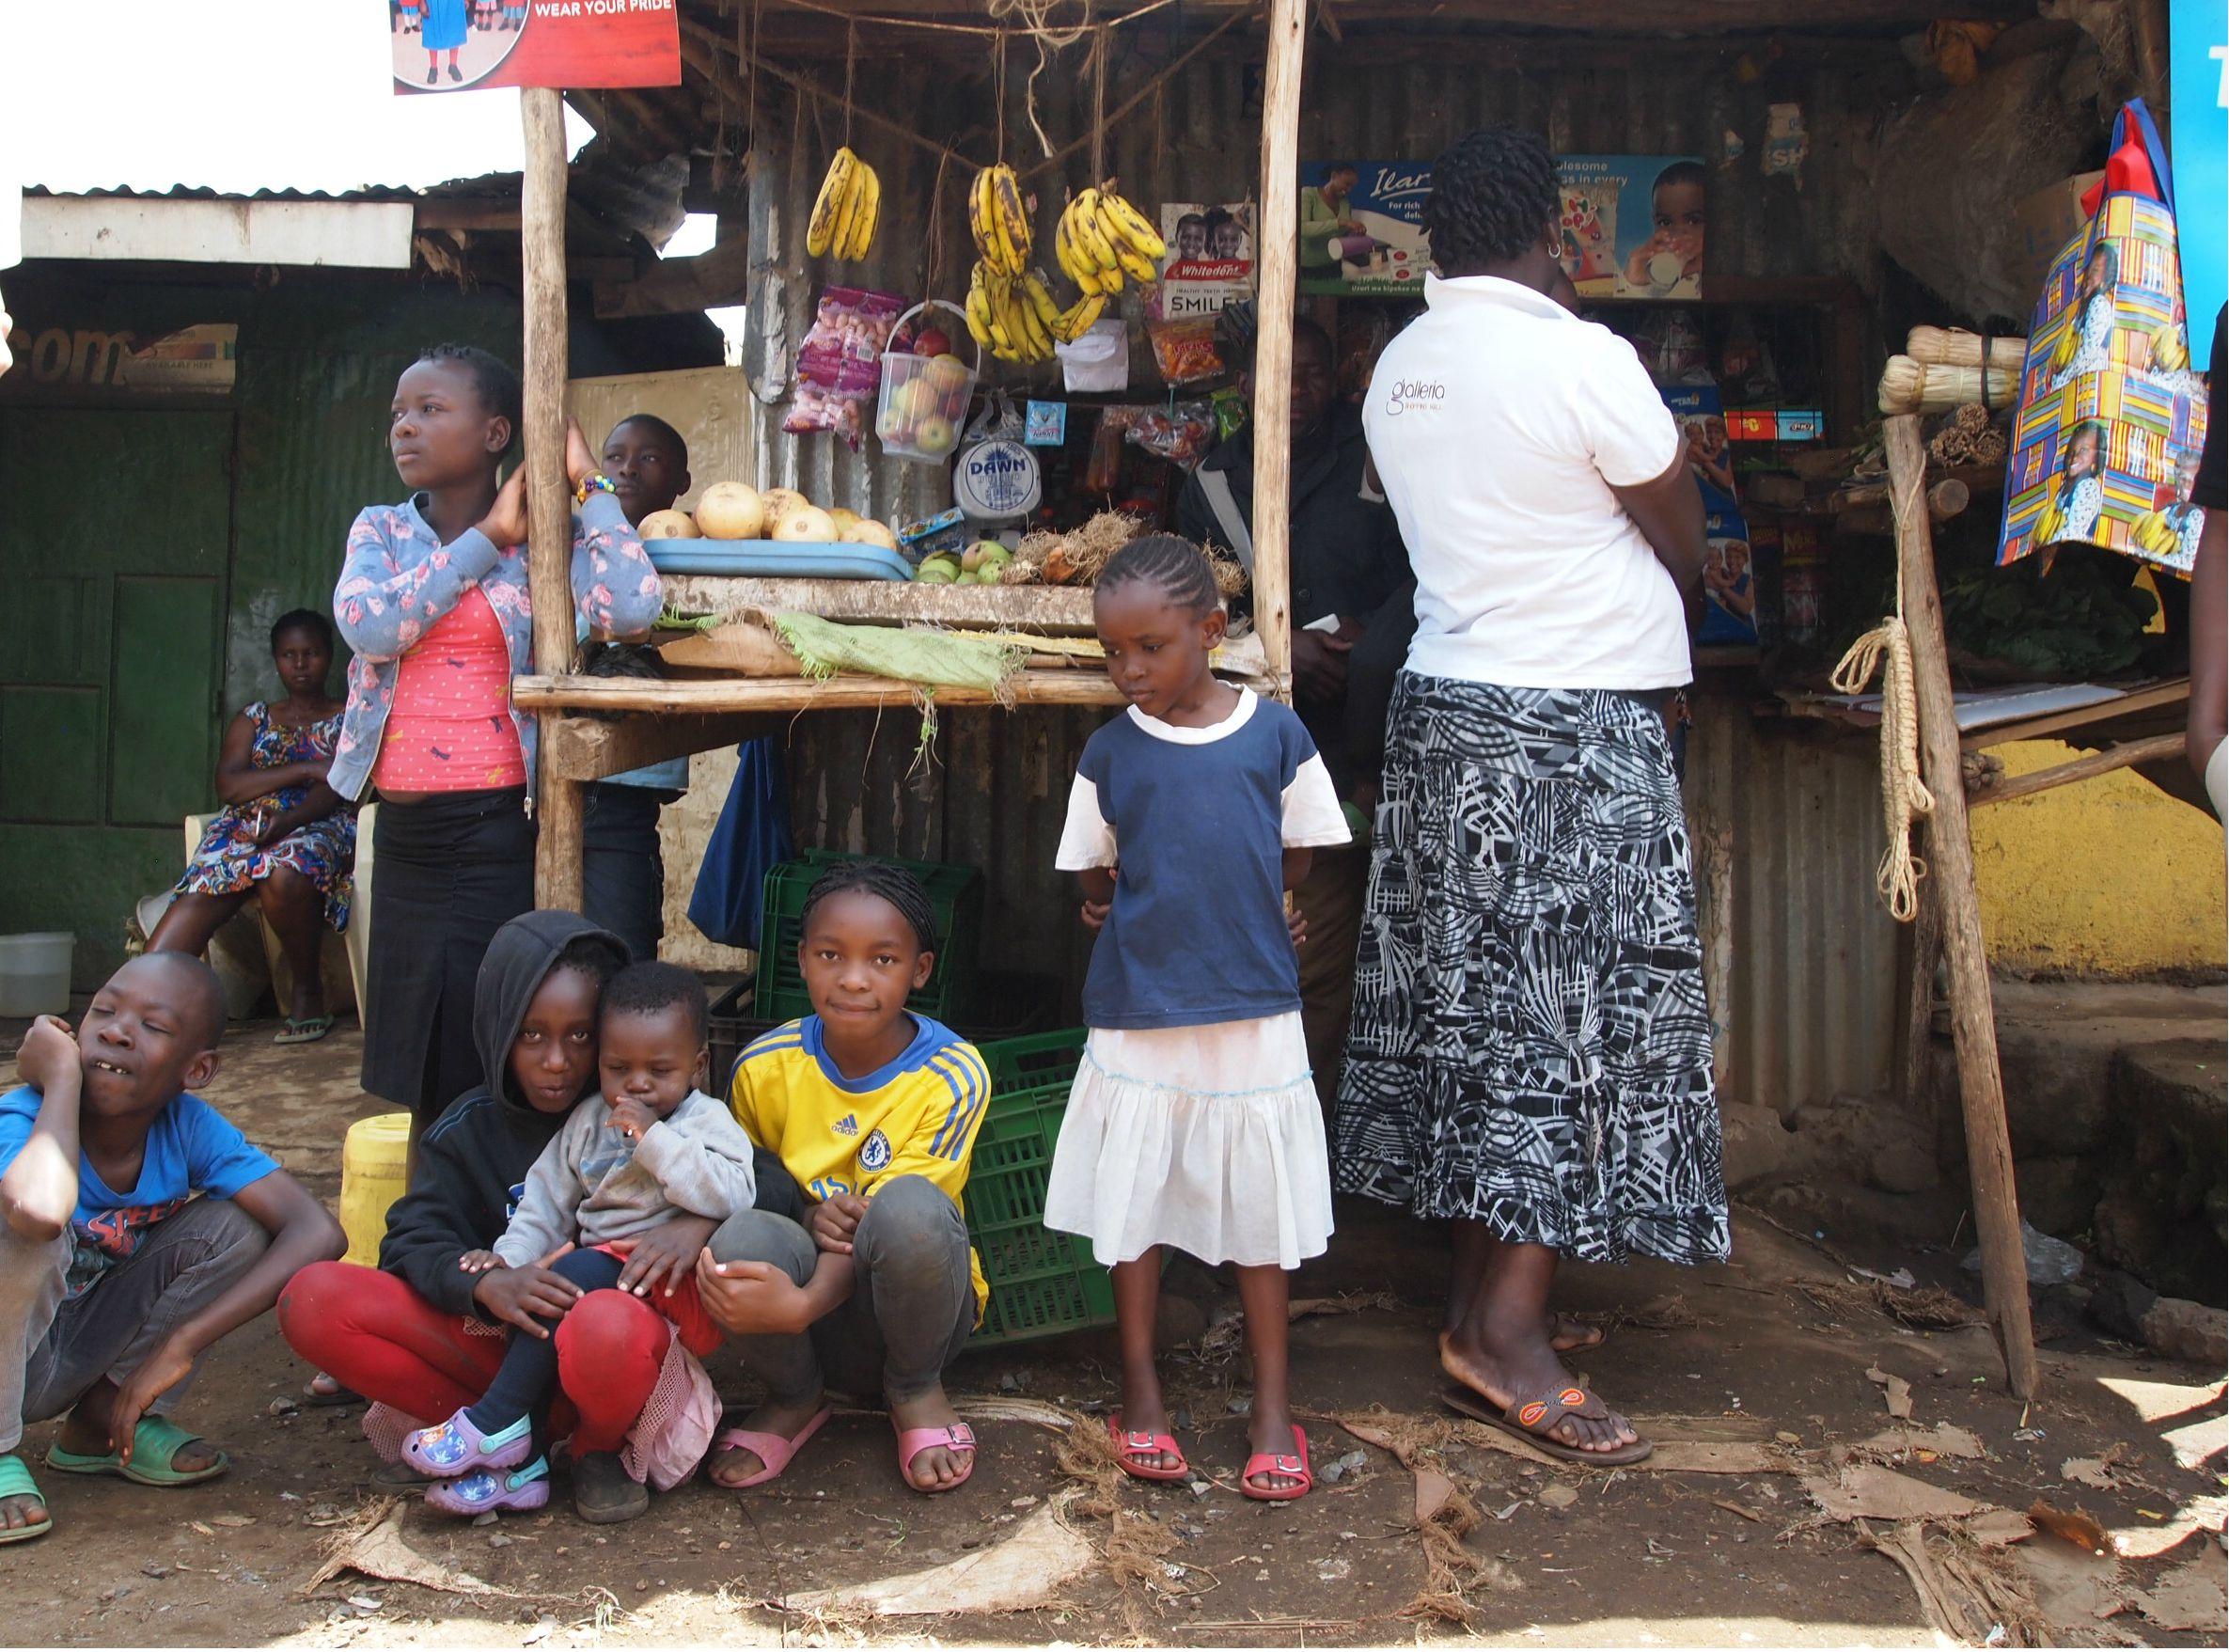 nairobi kenya slums mastercard kionect